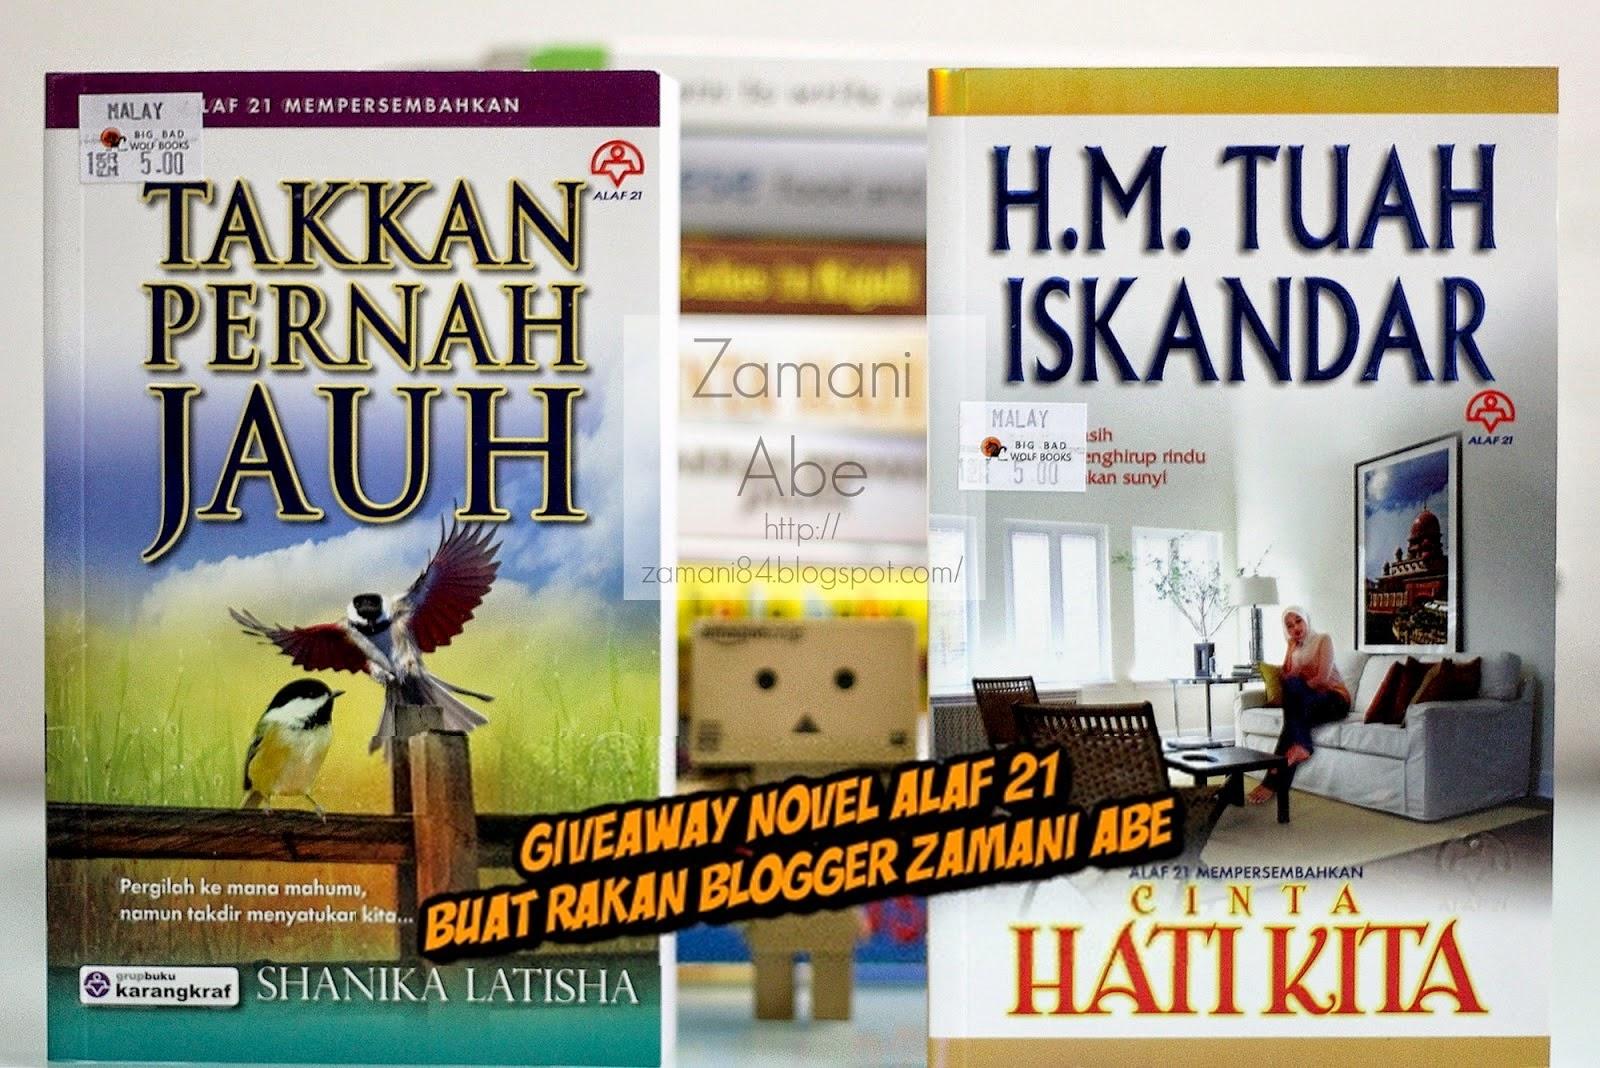 http://zamani84.blogspot.com/2015/02/giveaway-novel-alaf-21-buat-rakan.html